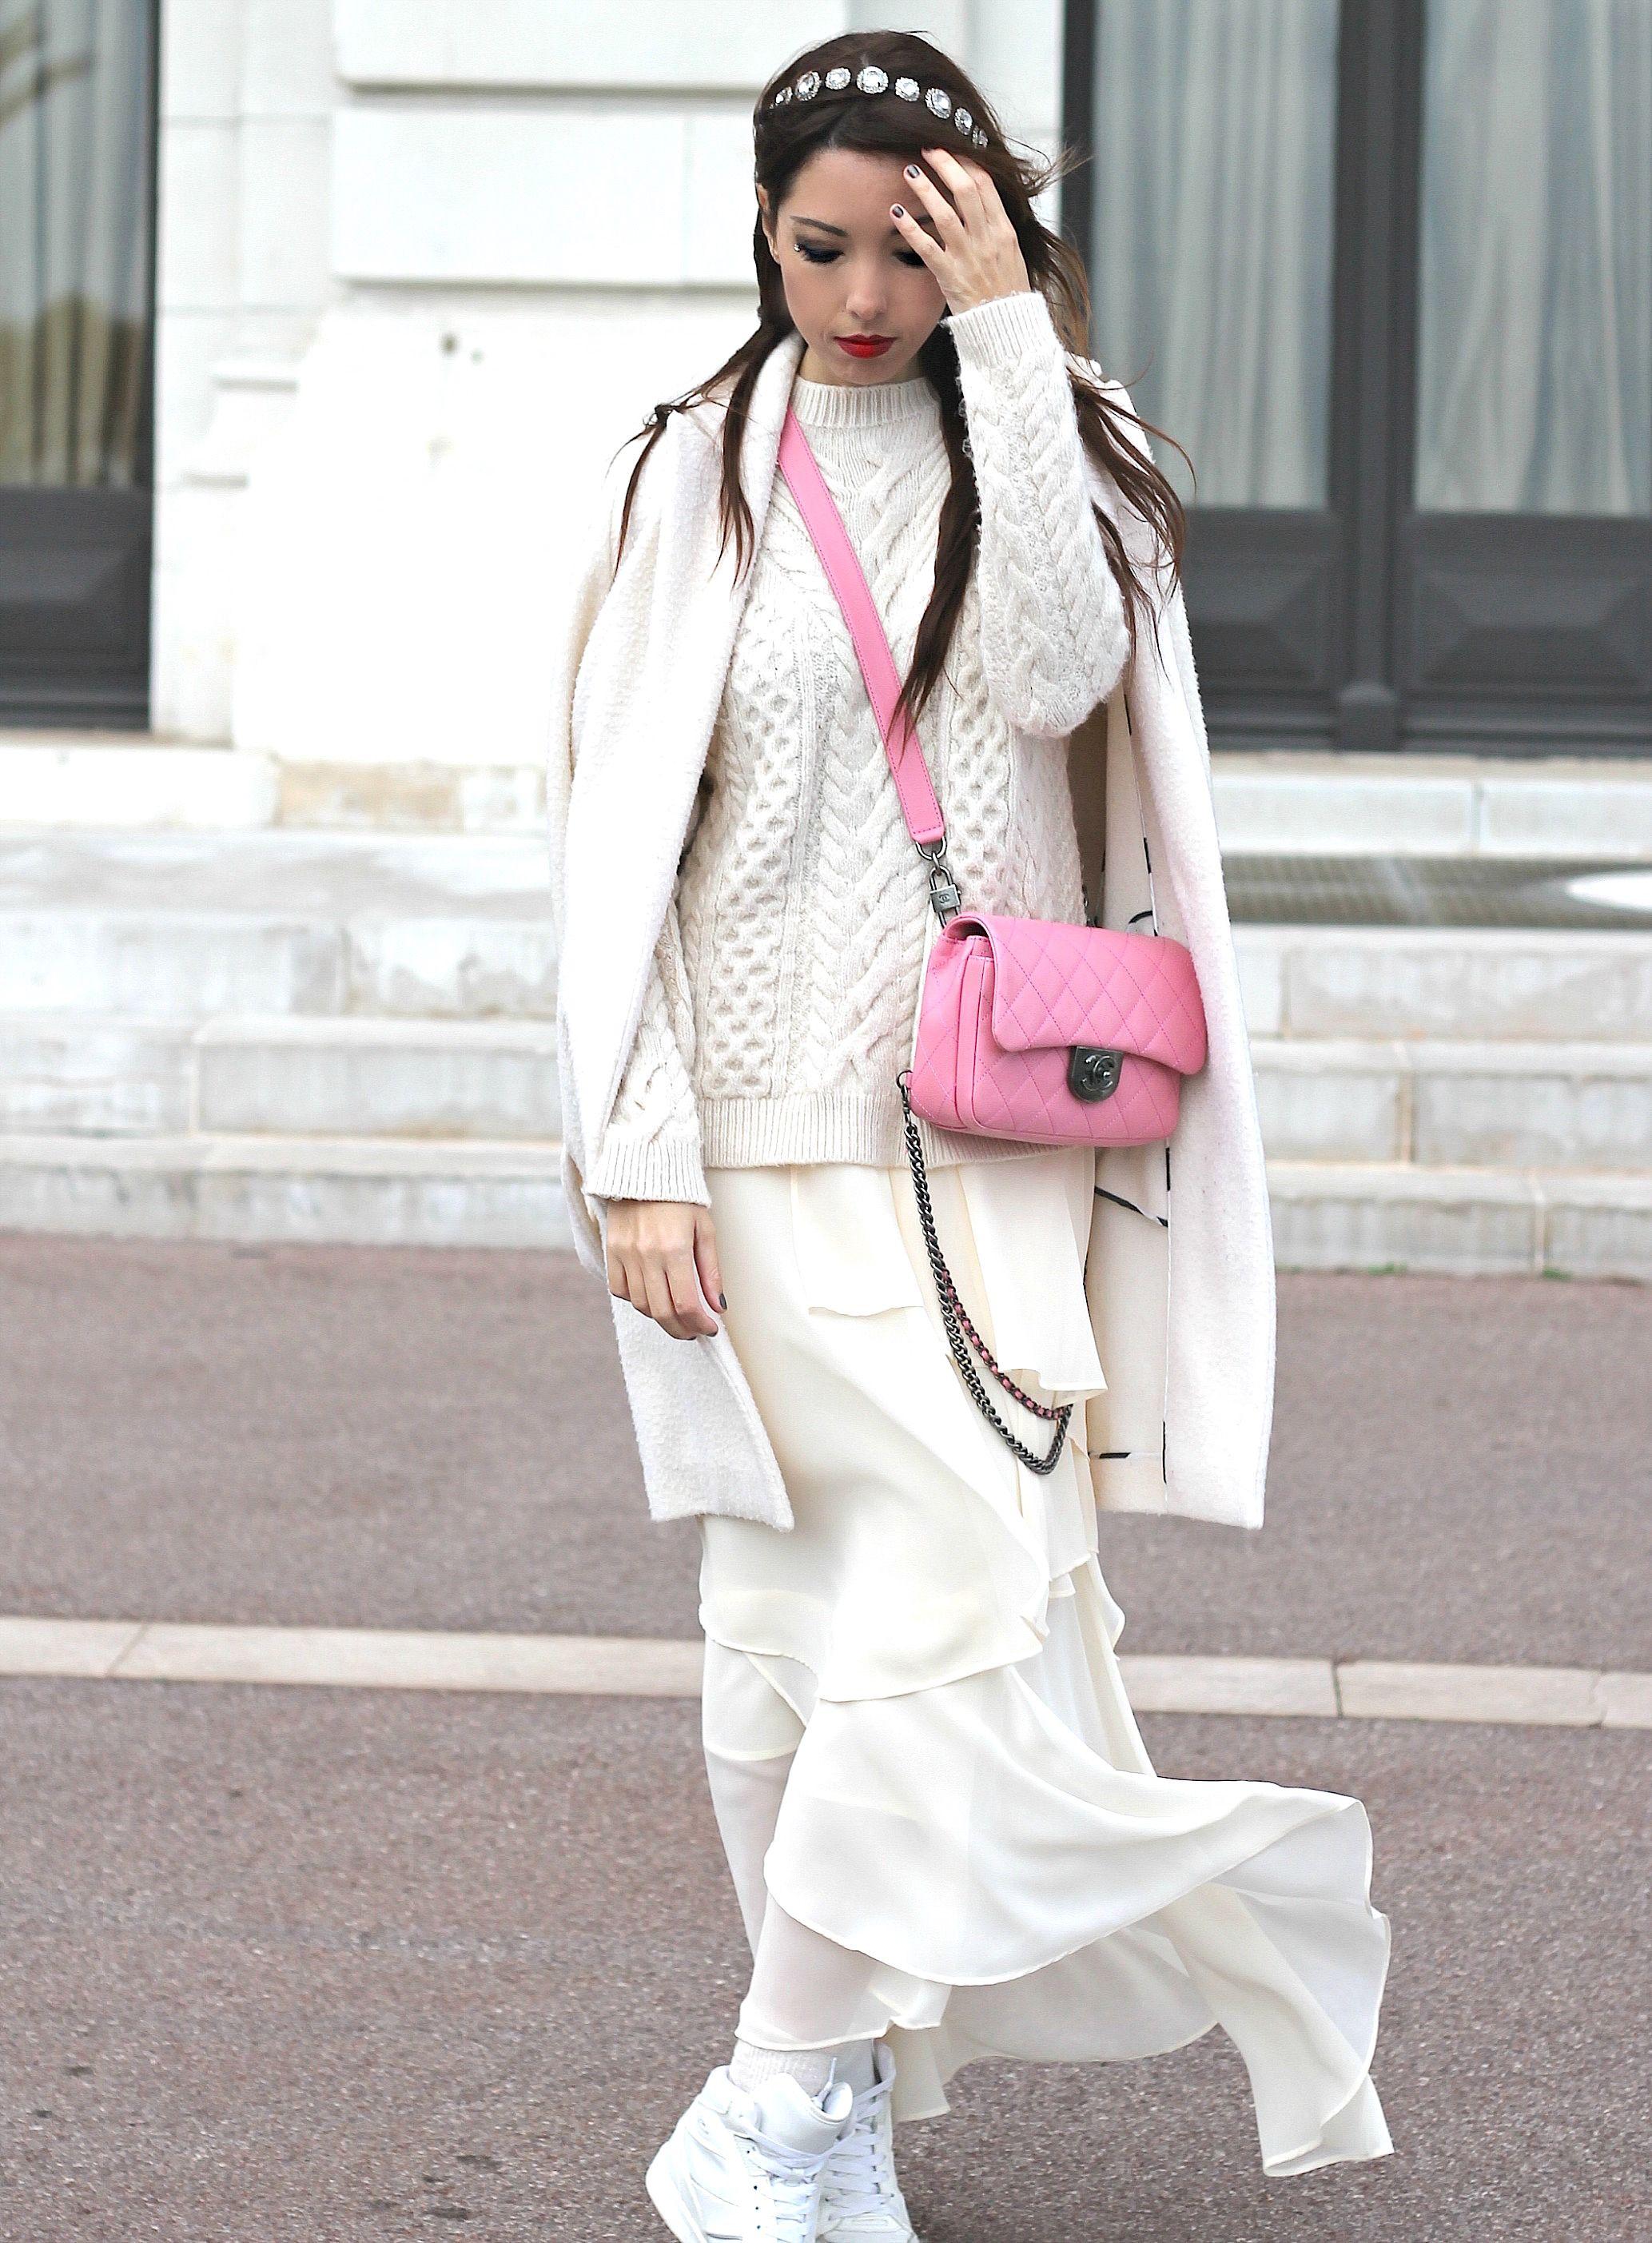 elisa bellino, chanel bag pink, theladycracy.it, fashion blogger italiane famose, fashion blog italia,prospettive lavoro futuro, total white look, zarina outfit, chanel rosa borsa,